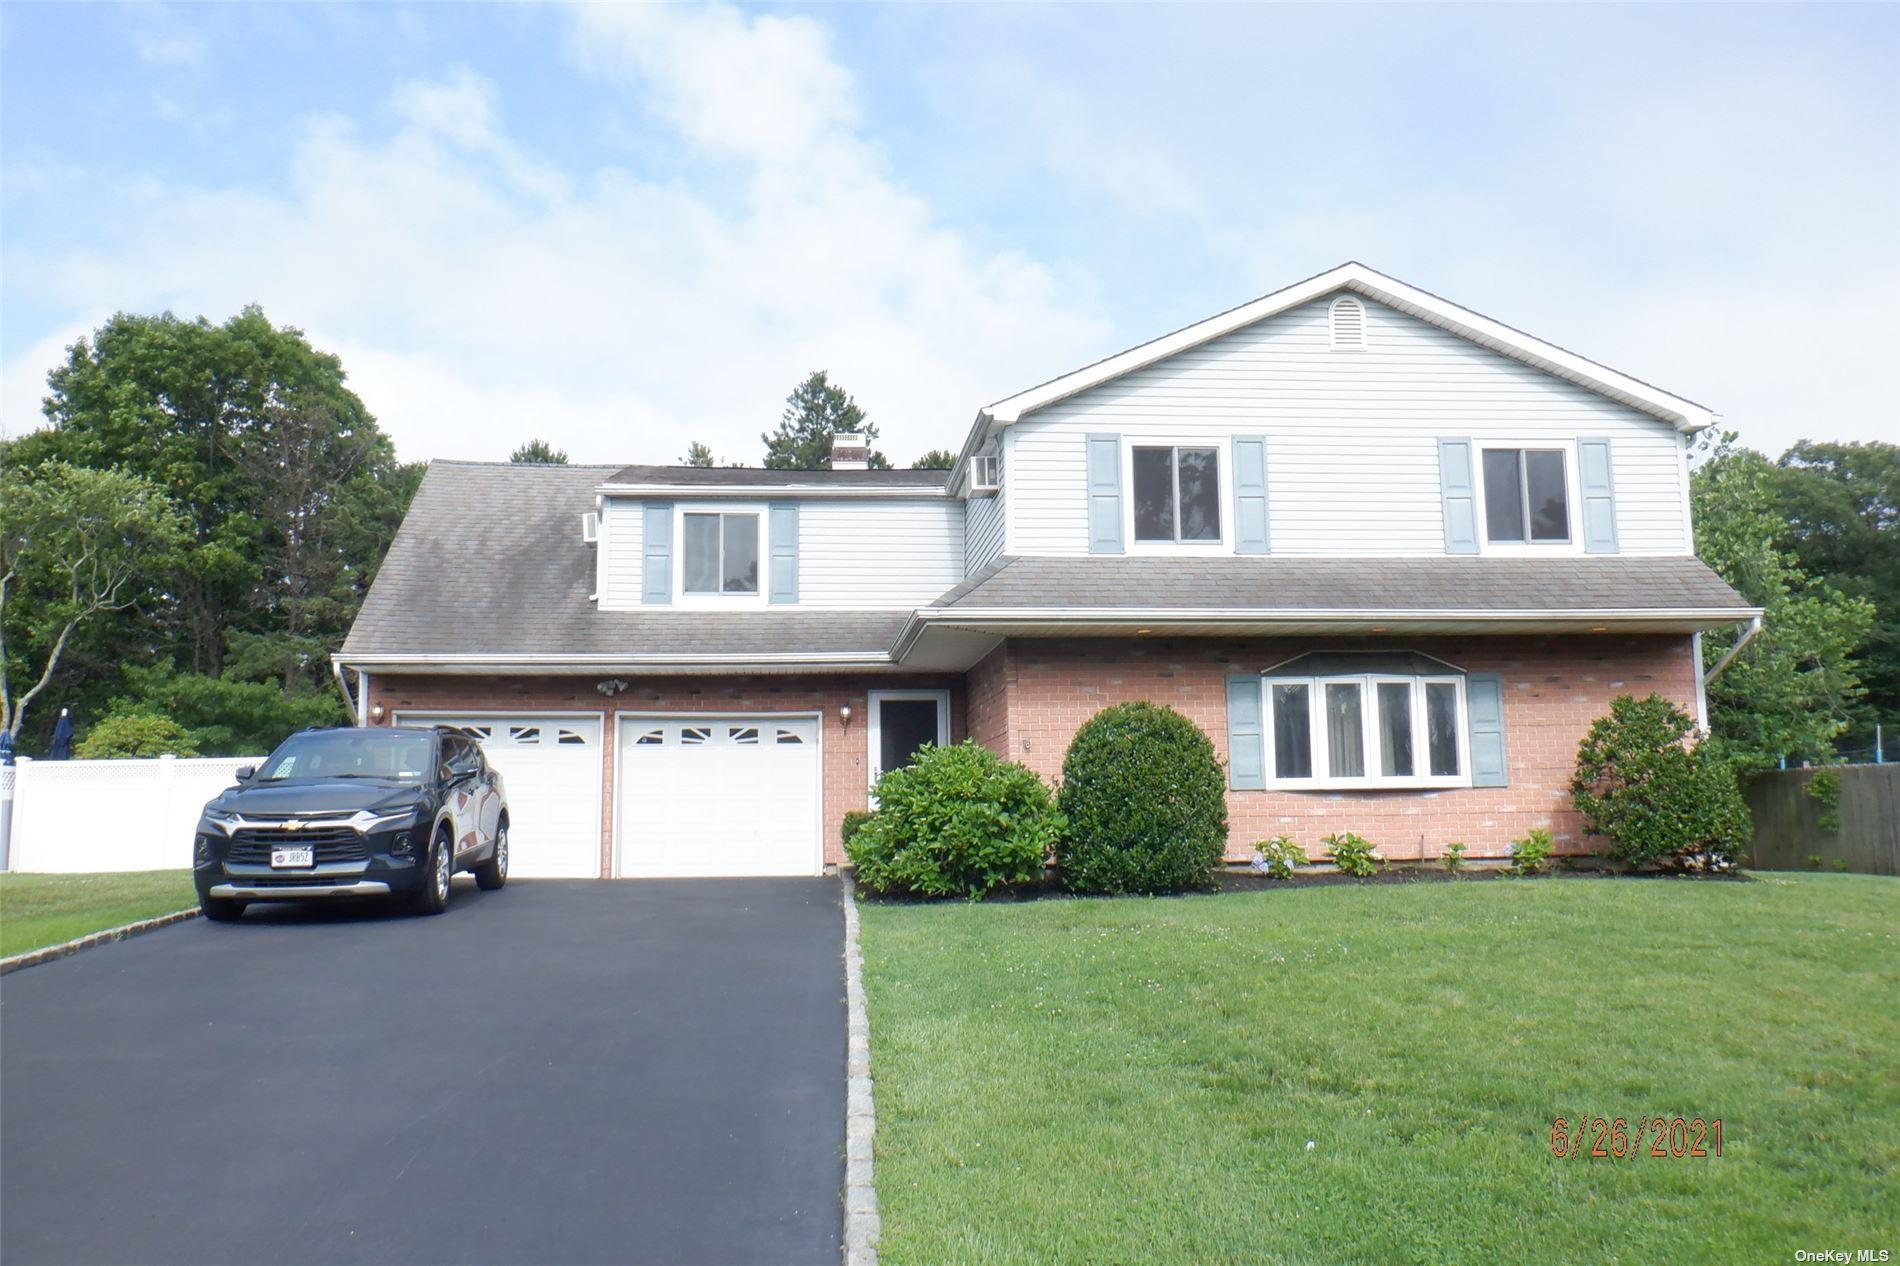 87 White Pine Way, Medford, NY 11763 - MLS#: 3325493